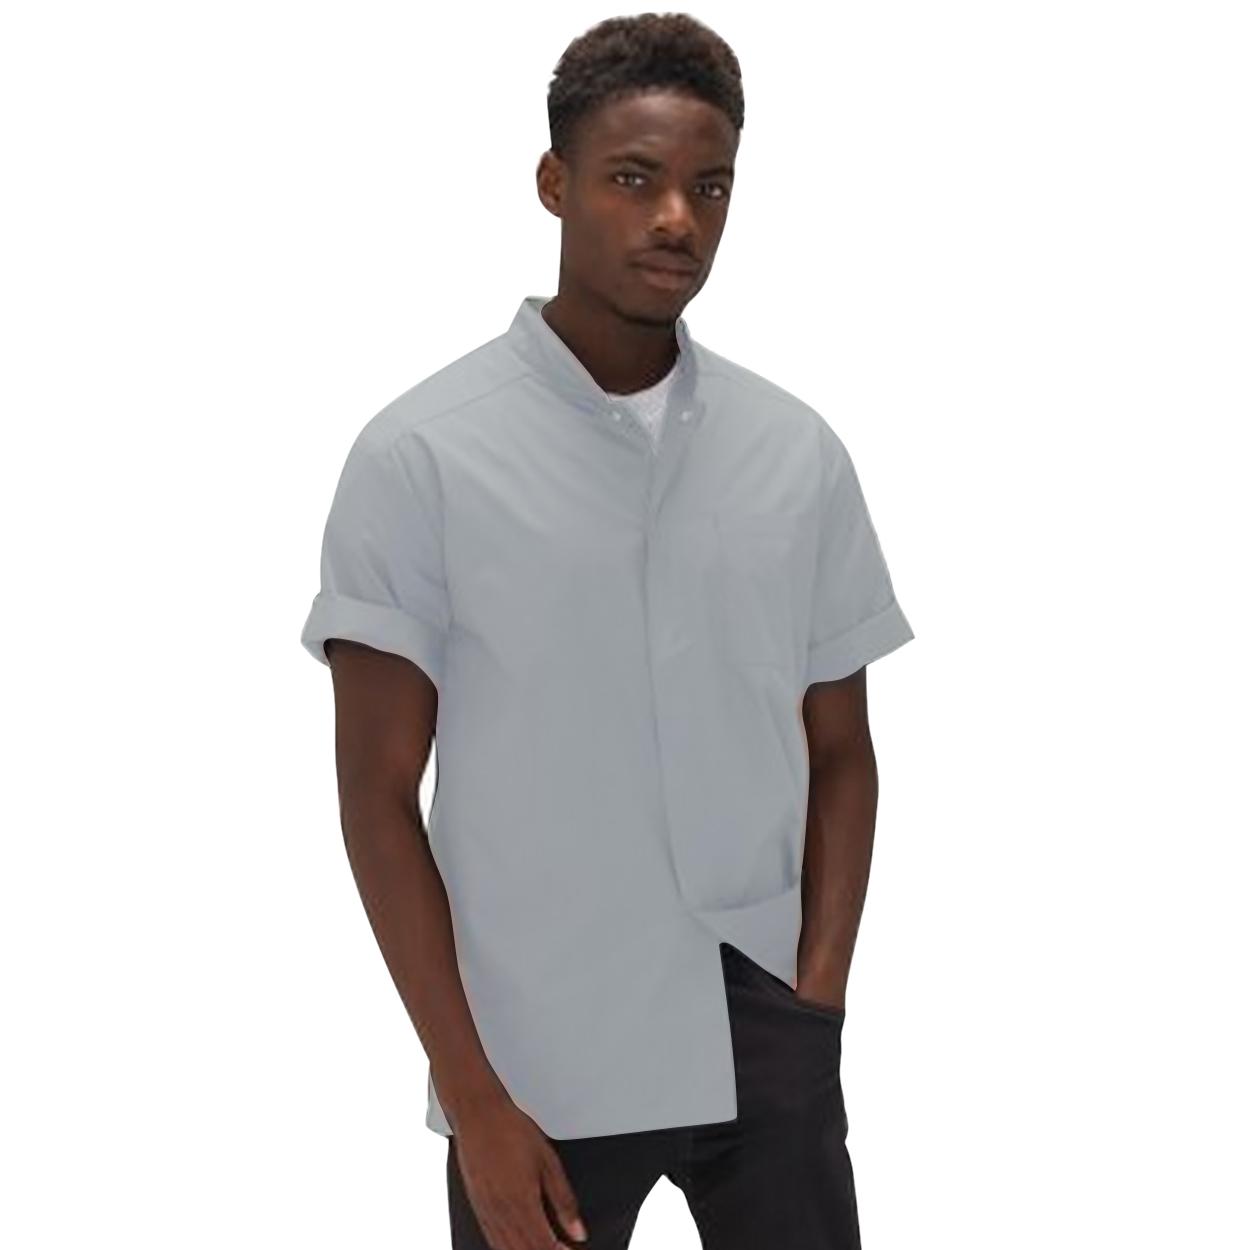 Le Chef Mens Lightweight Shirt (XS) (White/White)